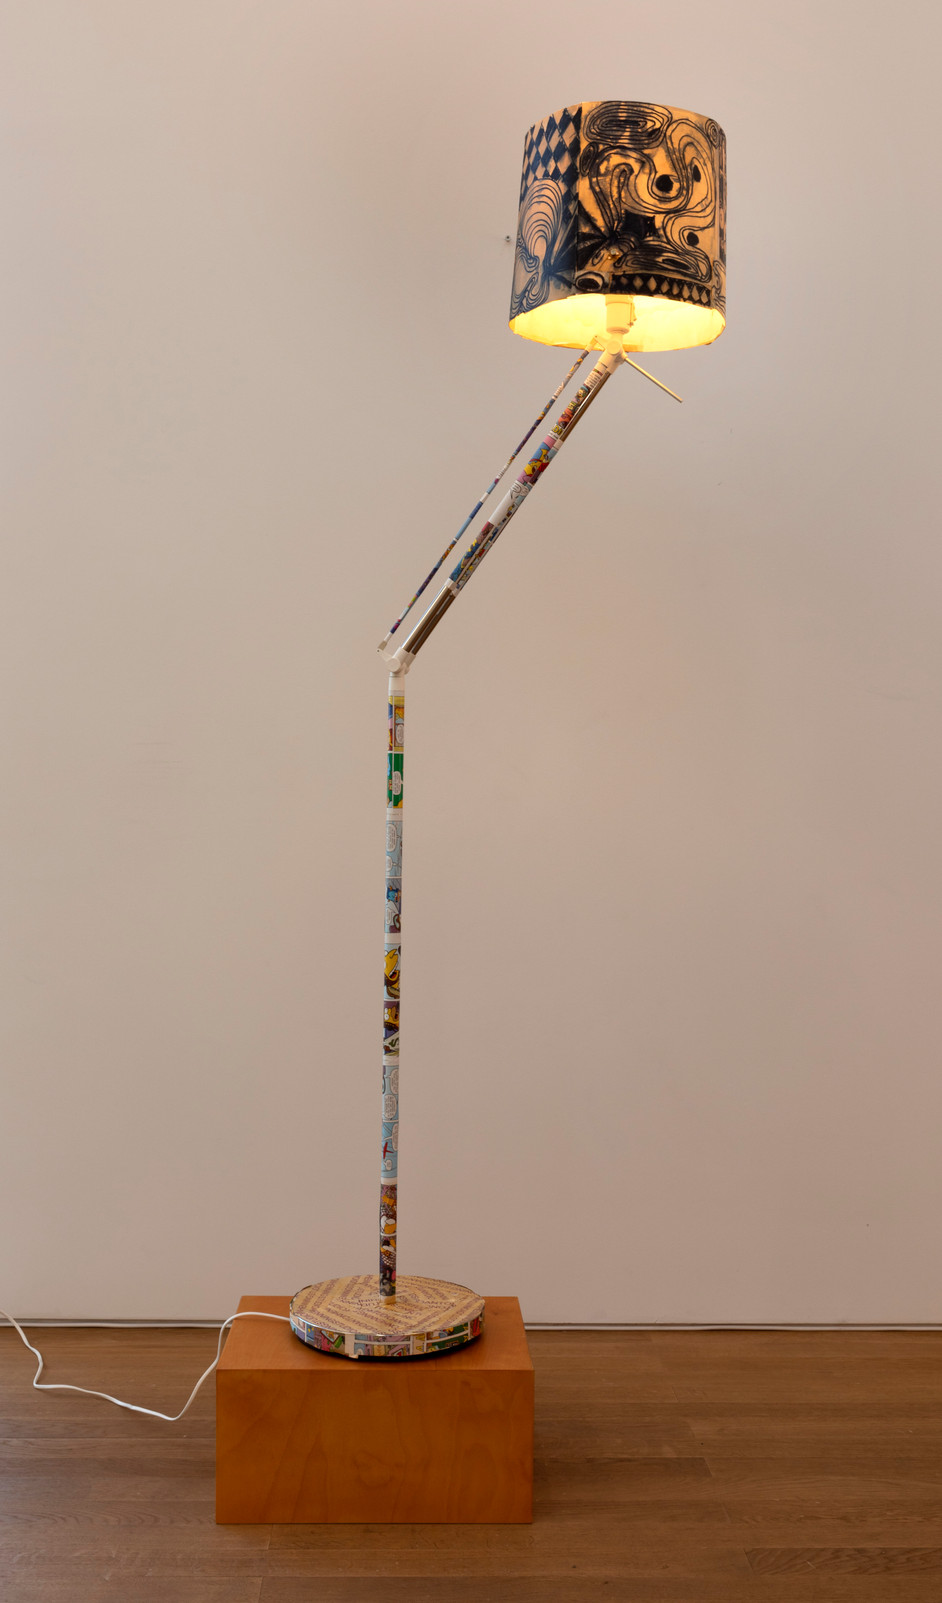 ANTON HENNING Stehlampe No. 8, 2019 metal, plastic, printed paper, marker on paper 152 x ø29 cm